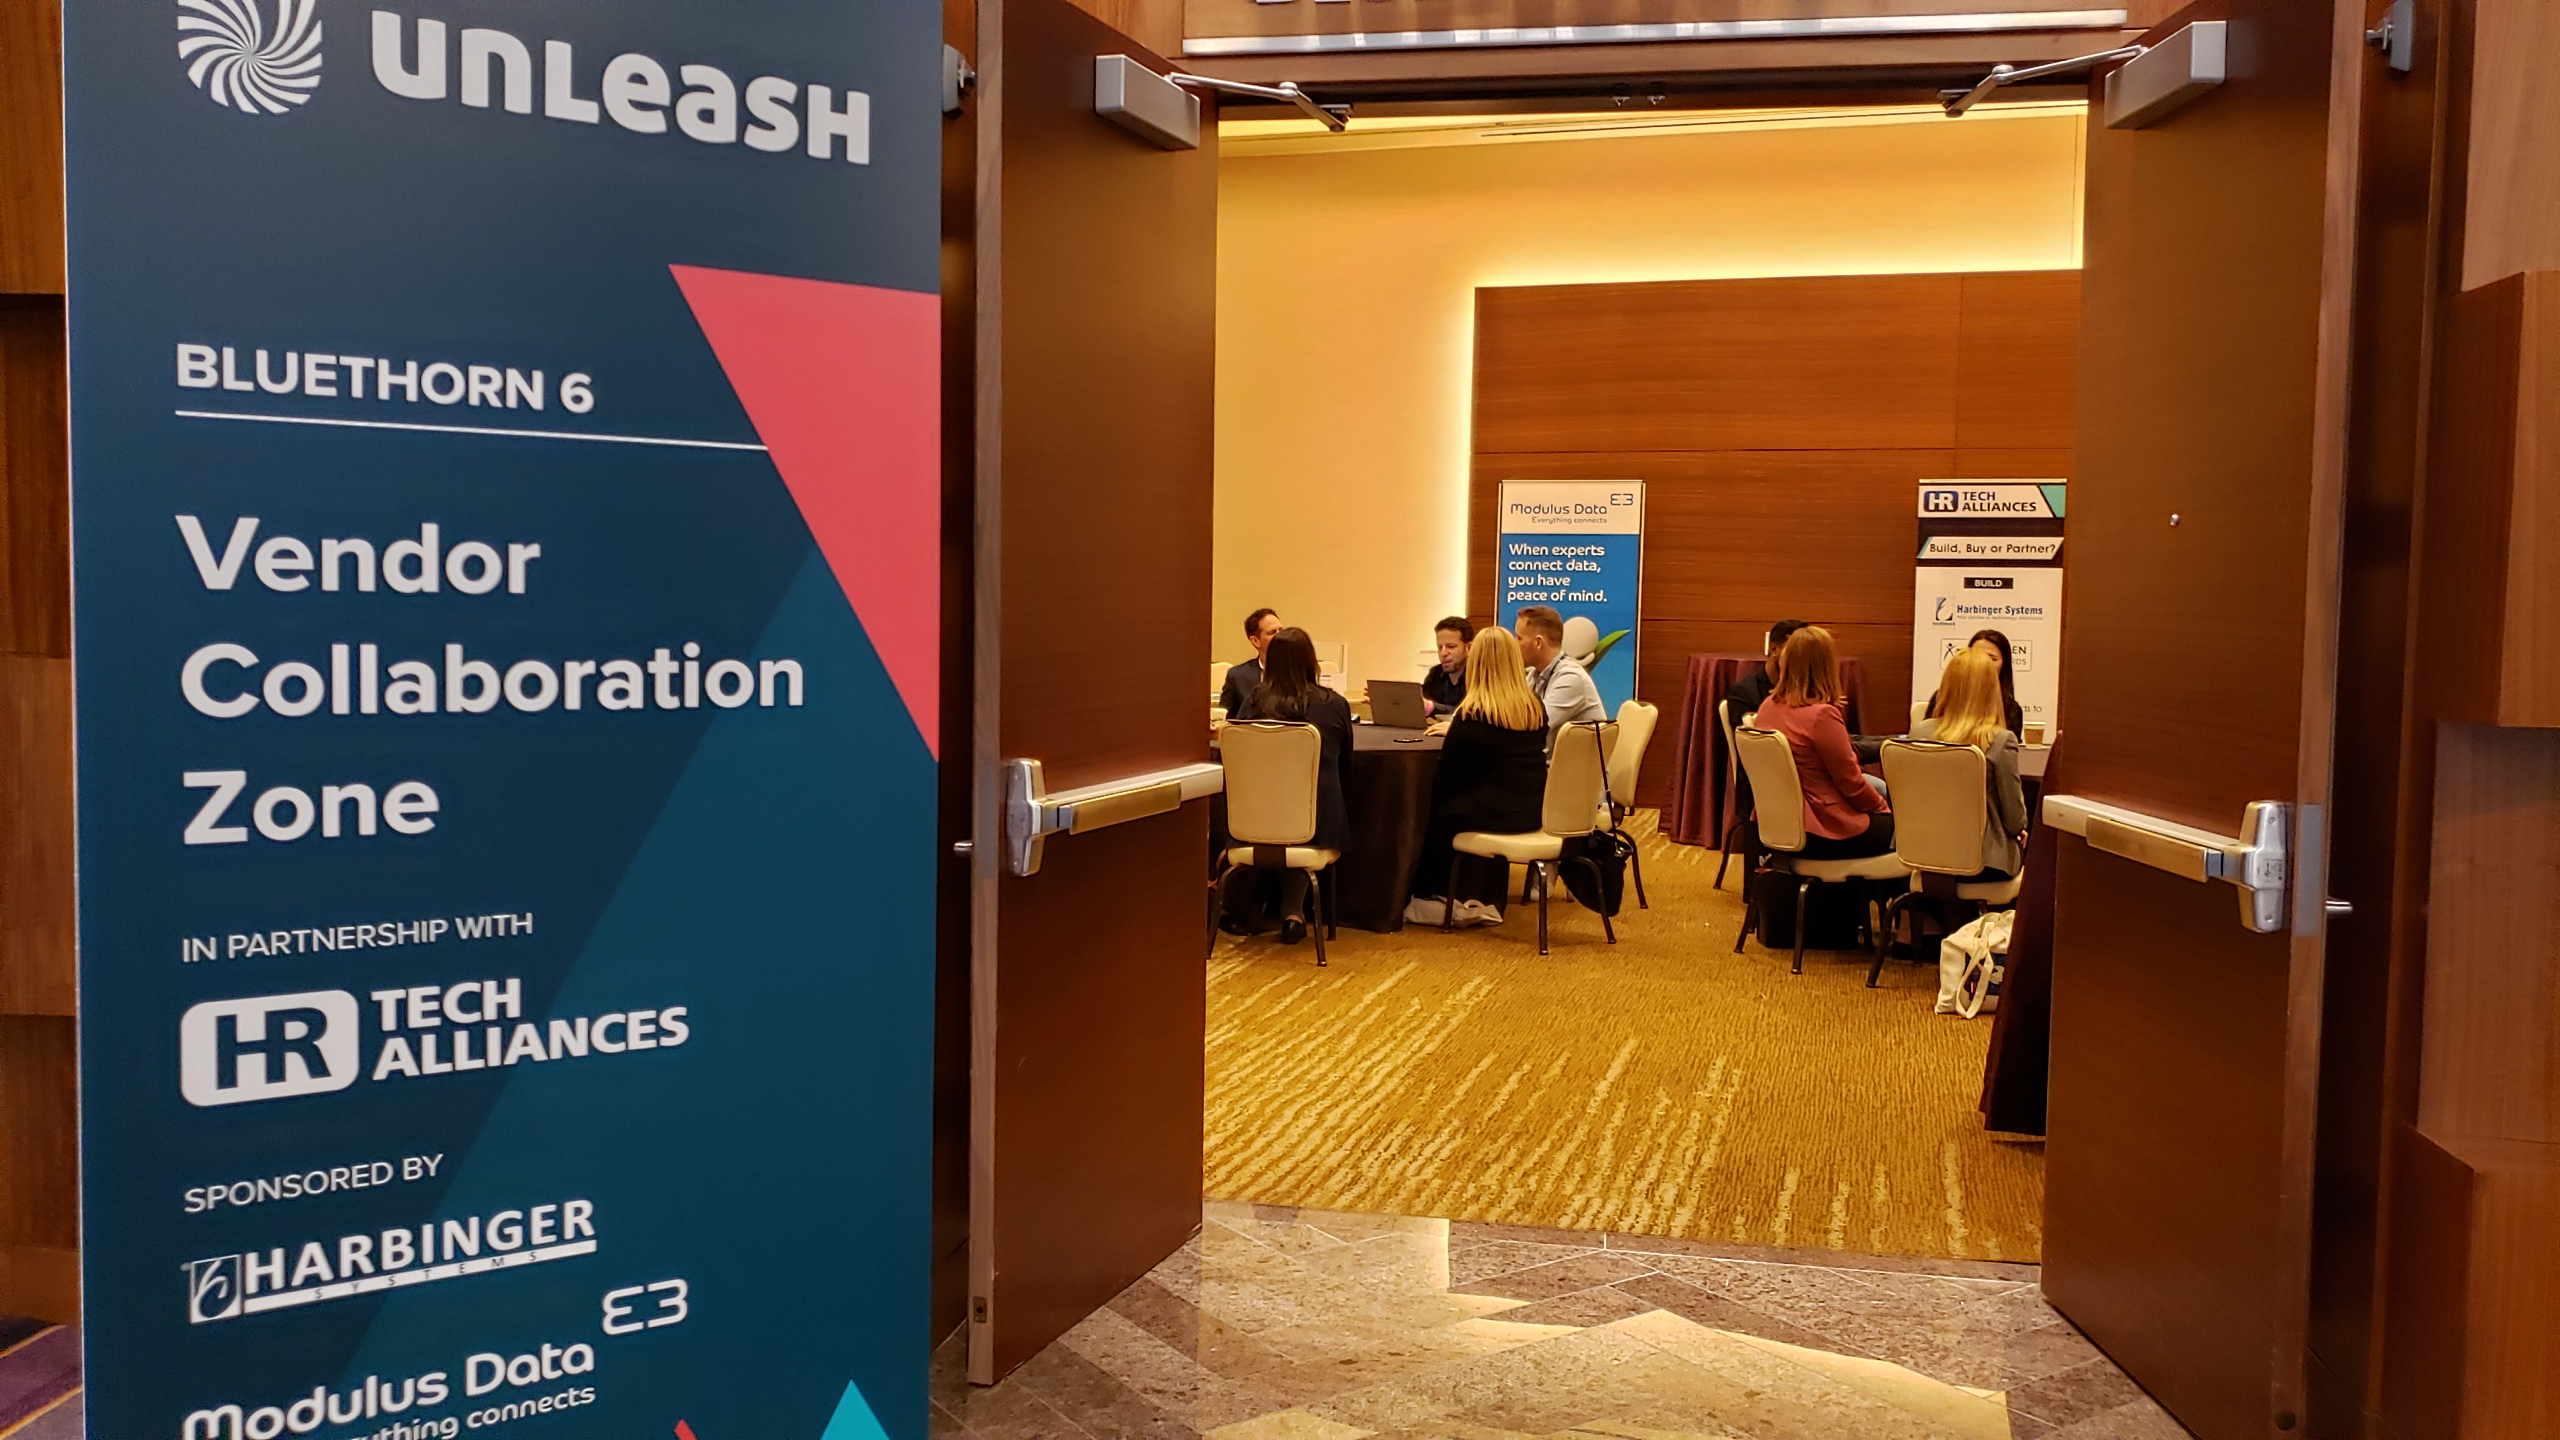 #UNLEASH19 #Collaboration Zone Round Table Topic Sessions #HRTech #Alliances #Partnerships